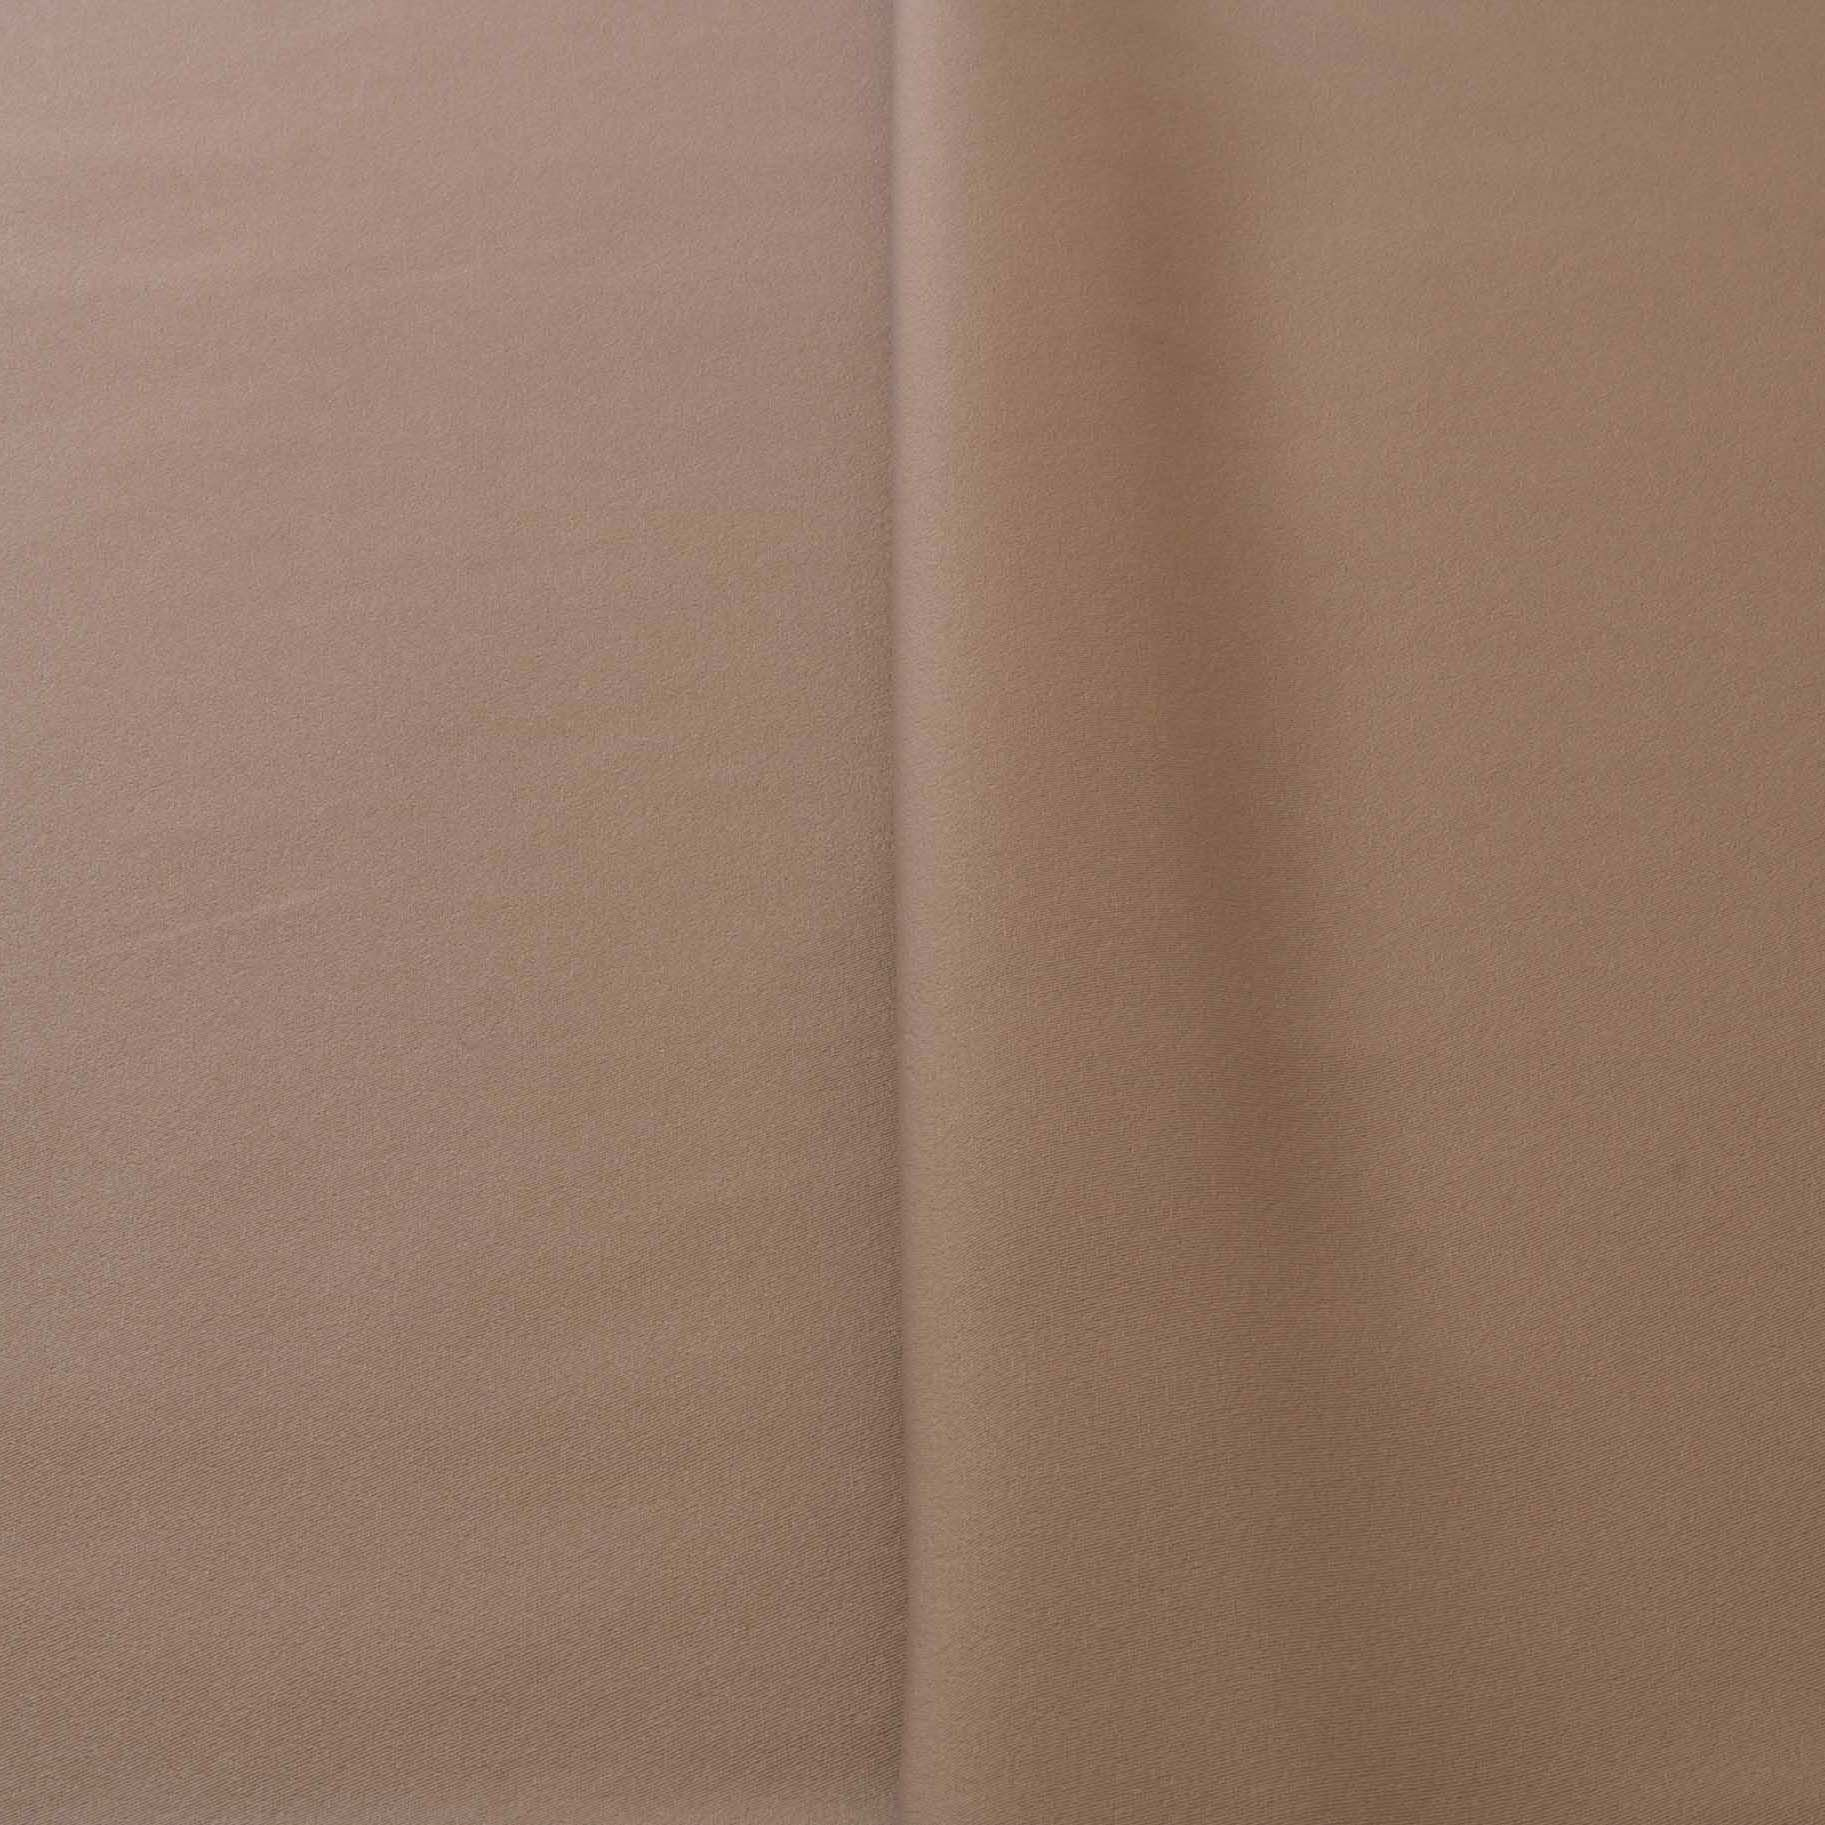 Tecido Gabardine Two Way Areia 96% Poliester 4% Elastano 1,50 m Largura